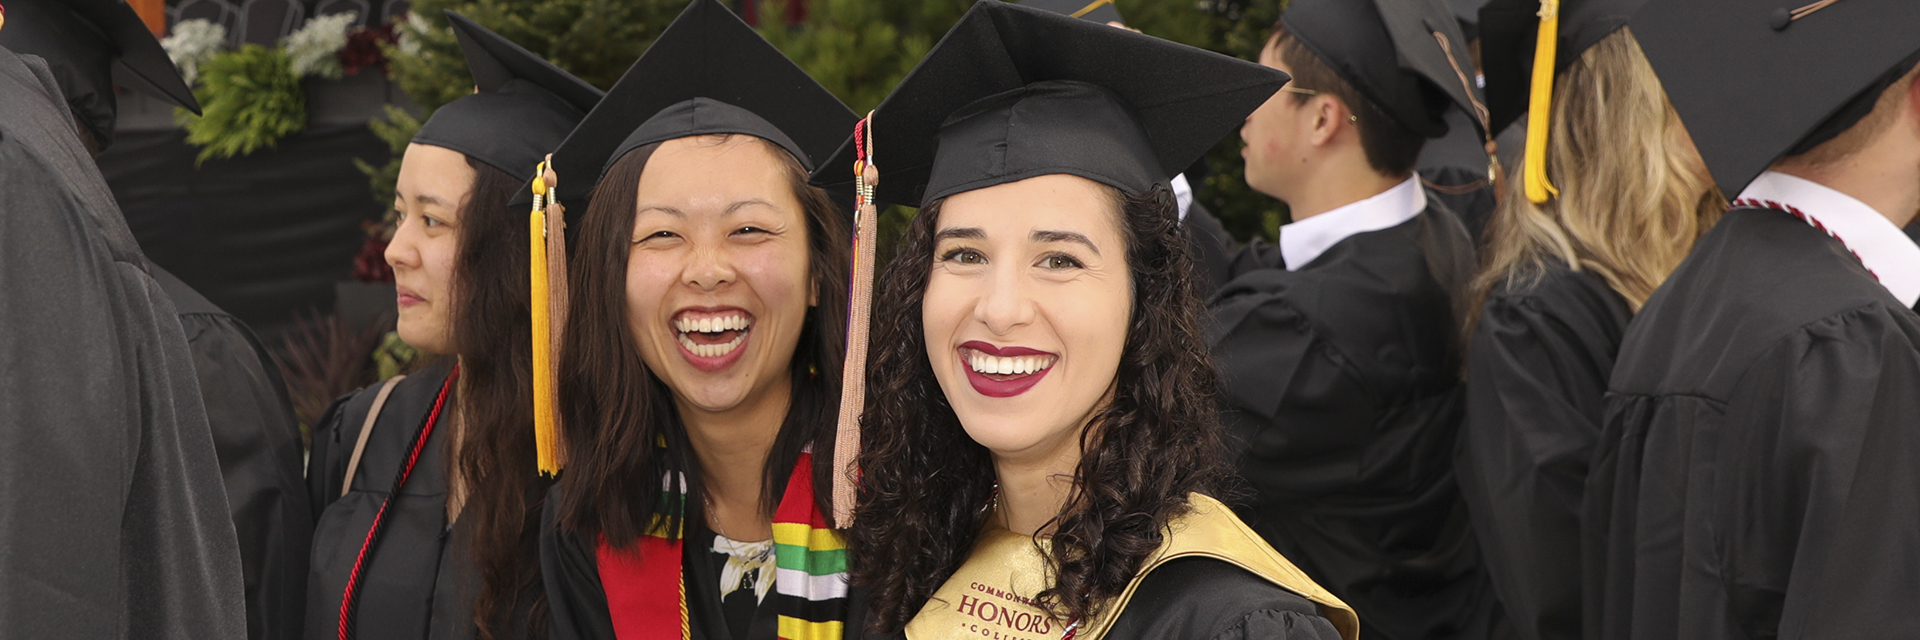 Mit Graduation Ceremony 2020.Commencement 2020 Umass Amherst